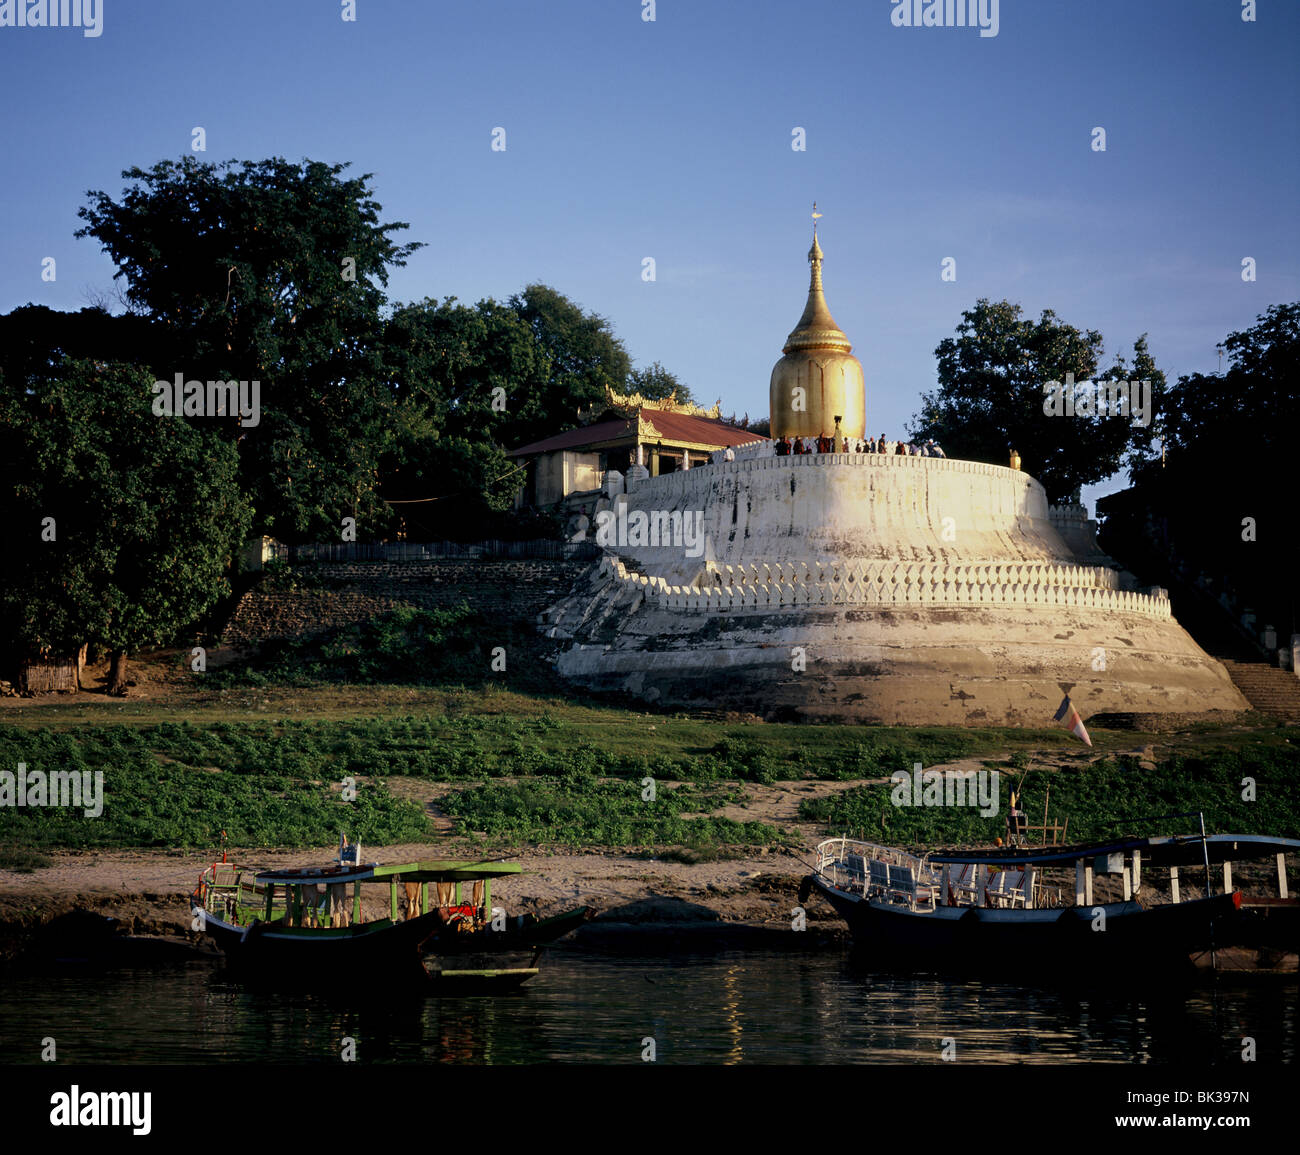 Bupaya pagoda on the banks of the Irrawaddy River, Bagan (Pagan), Myanmar (Burma), Asia - Stock Image